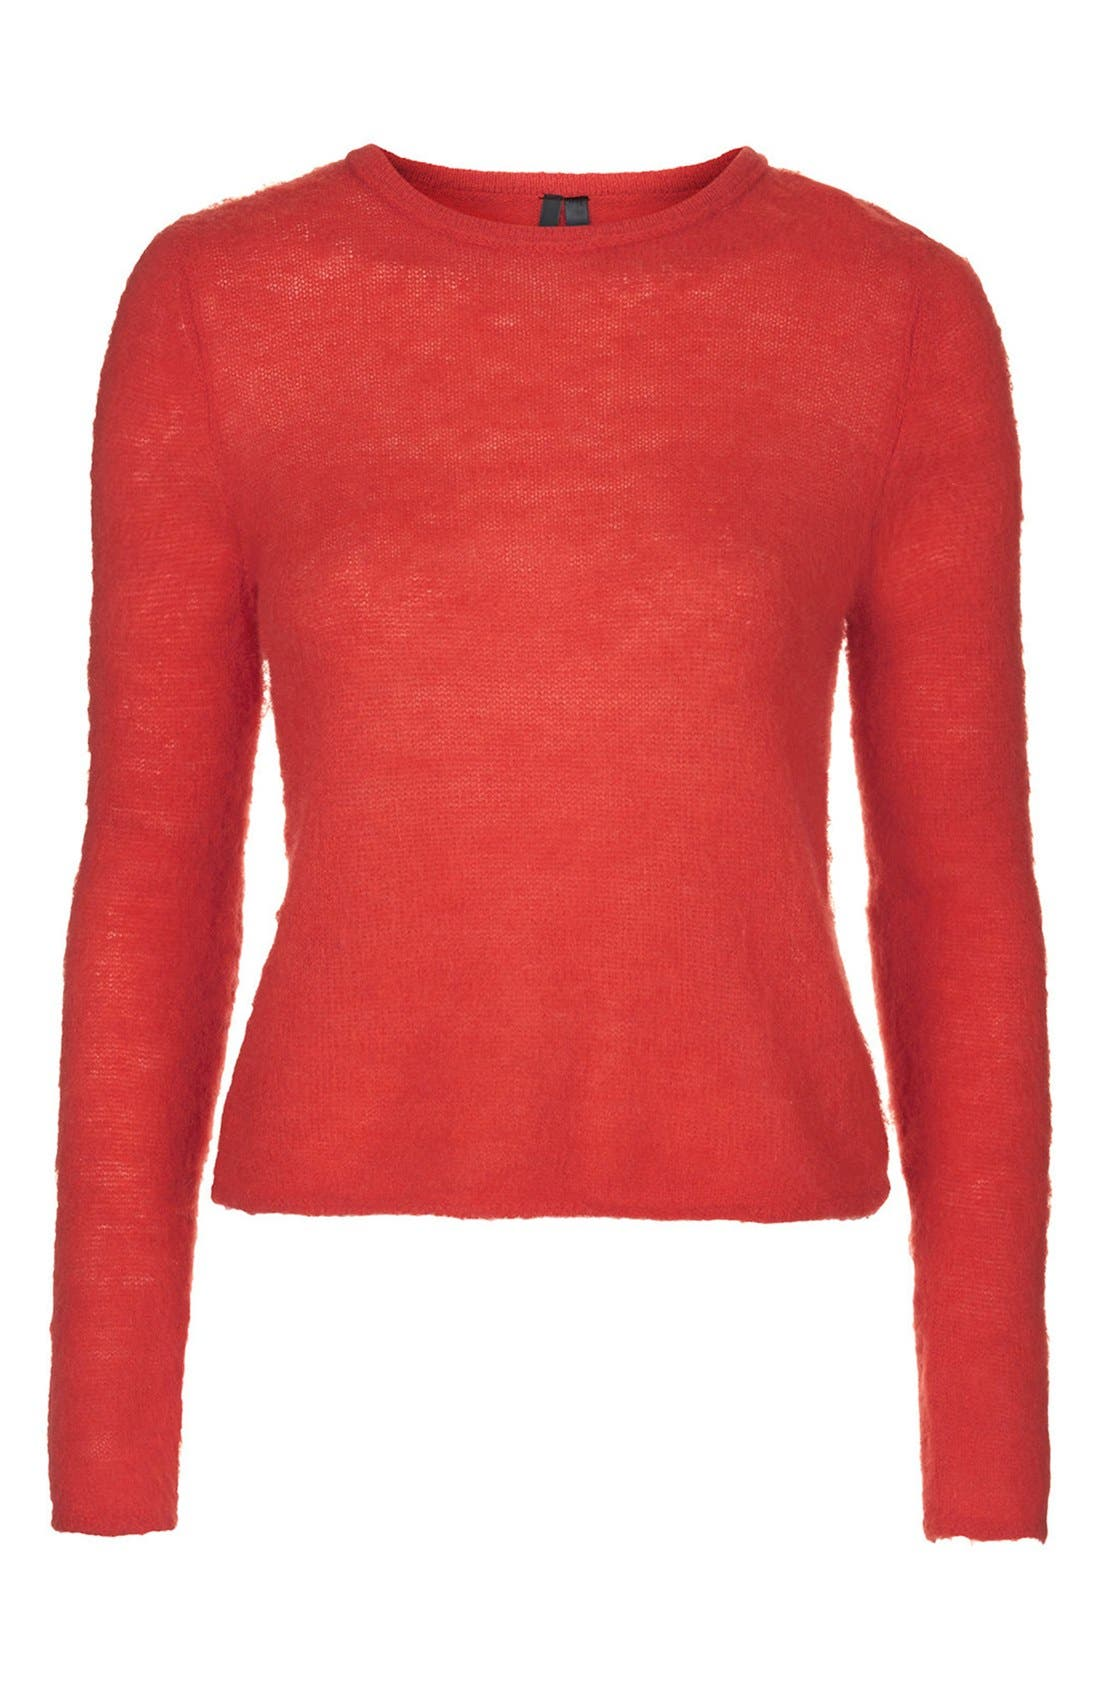 Alternate Image 3  - Topshop Boutique Fluorescent Fluffy Sweater